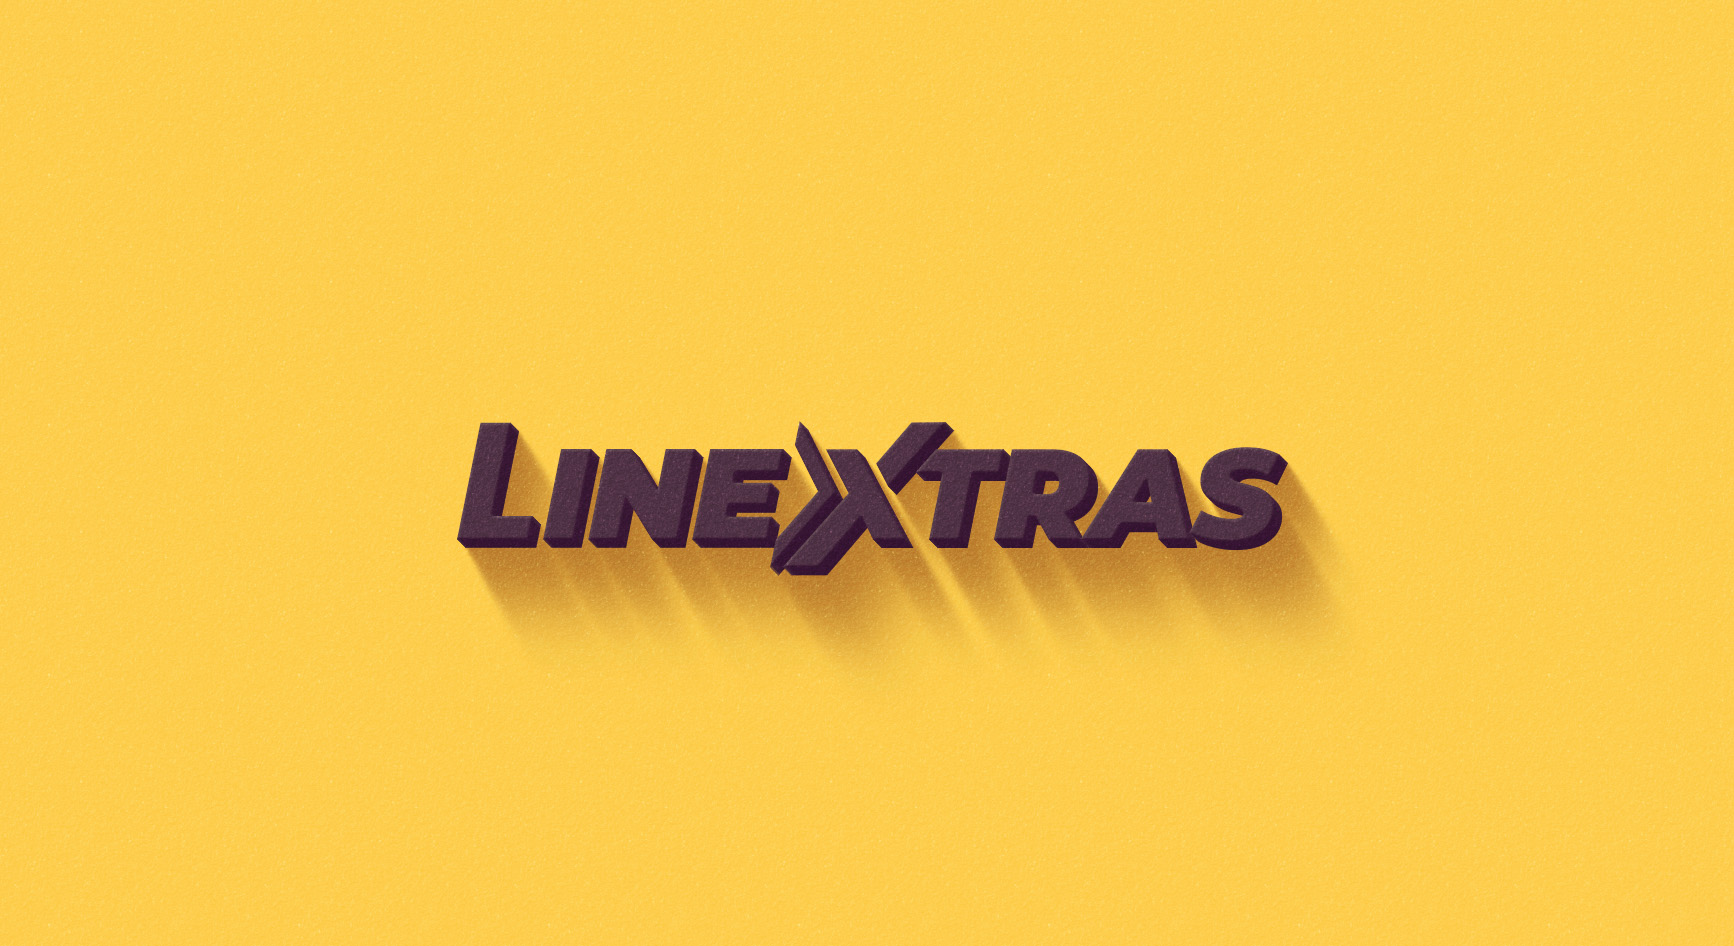 linextras logo